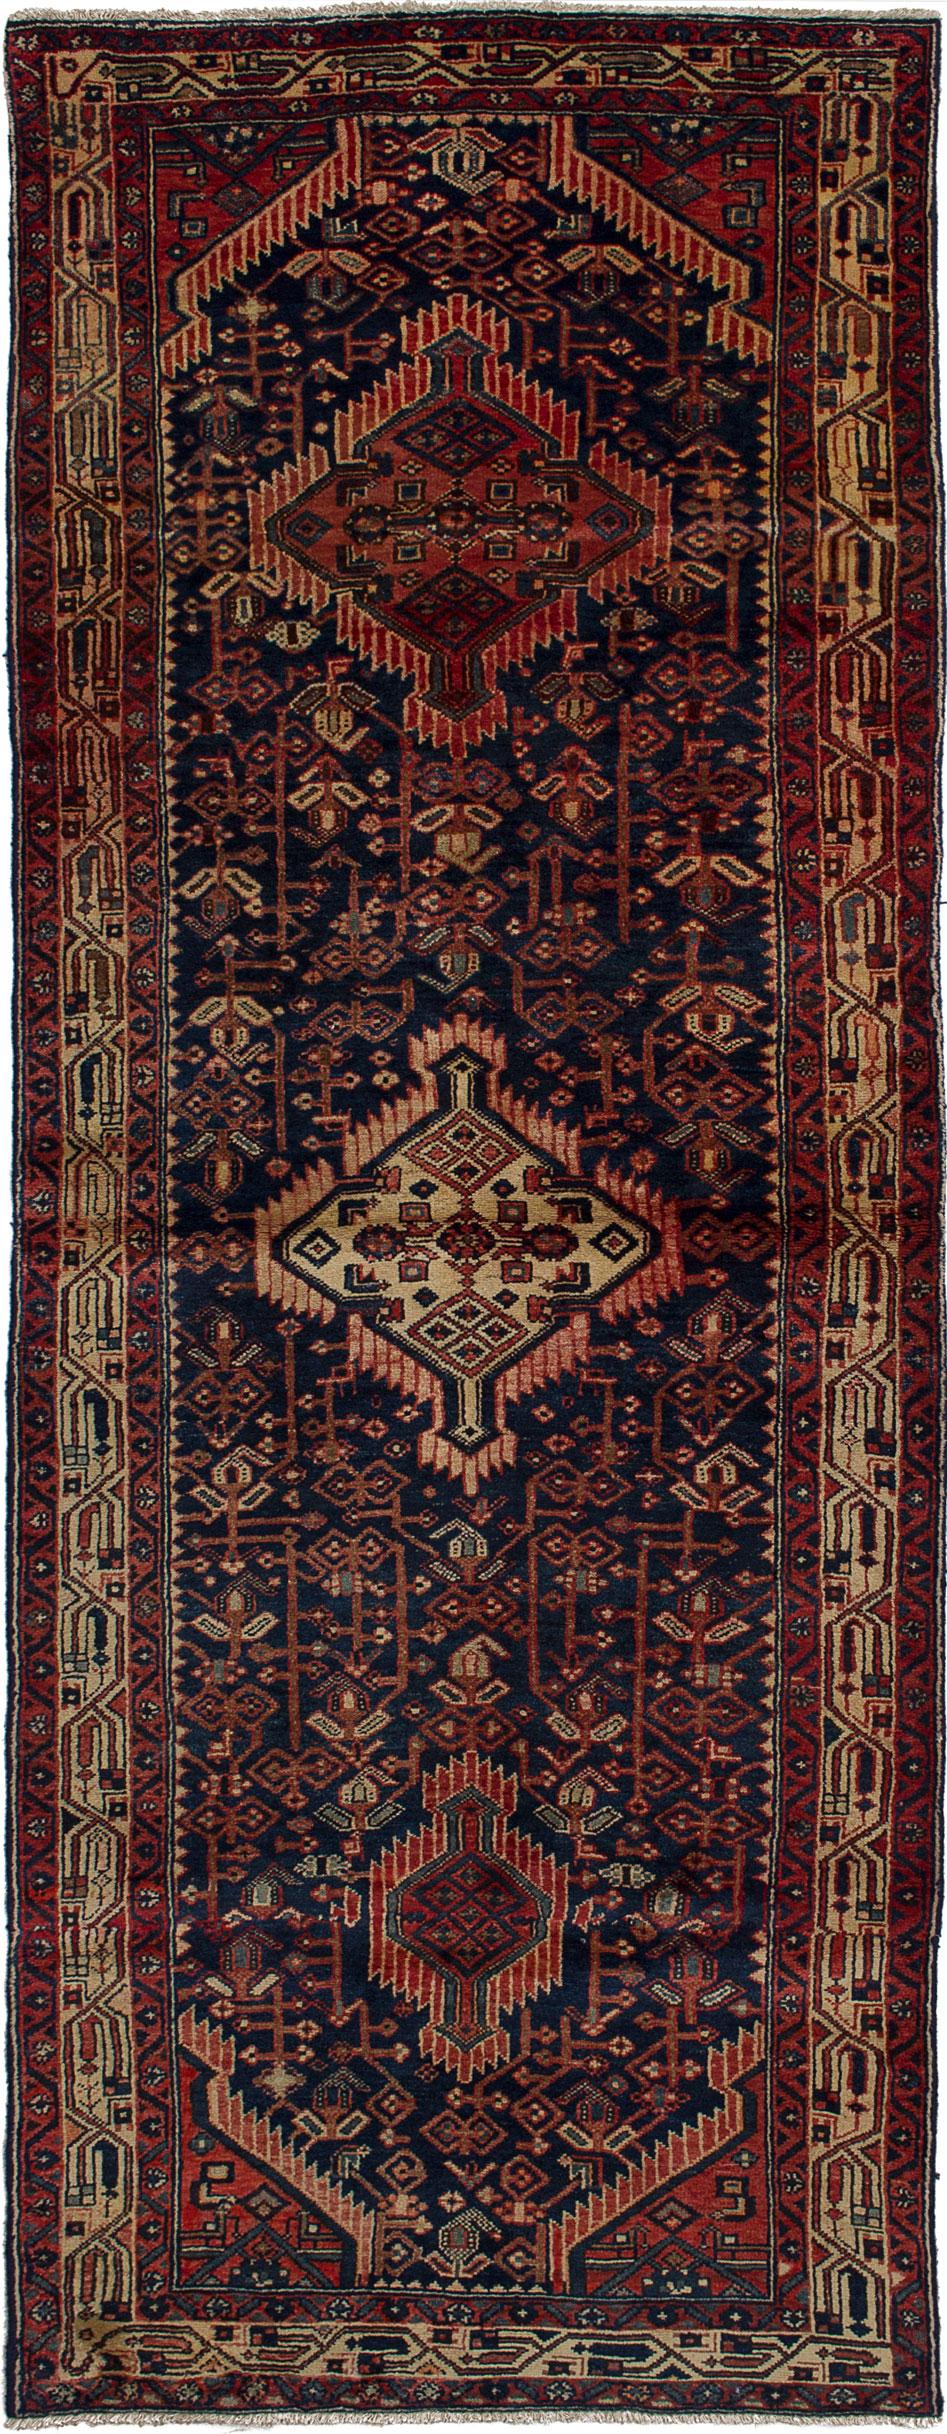 "Hand-knotted Hamadan Dark Blue Wool Rug 3'7"" x 9'6"" Size: 3'7"" x 9'6"""